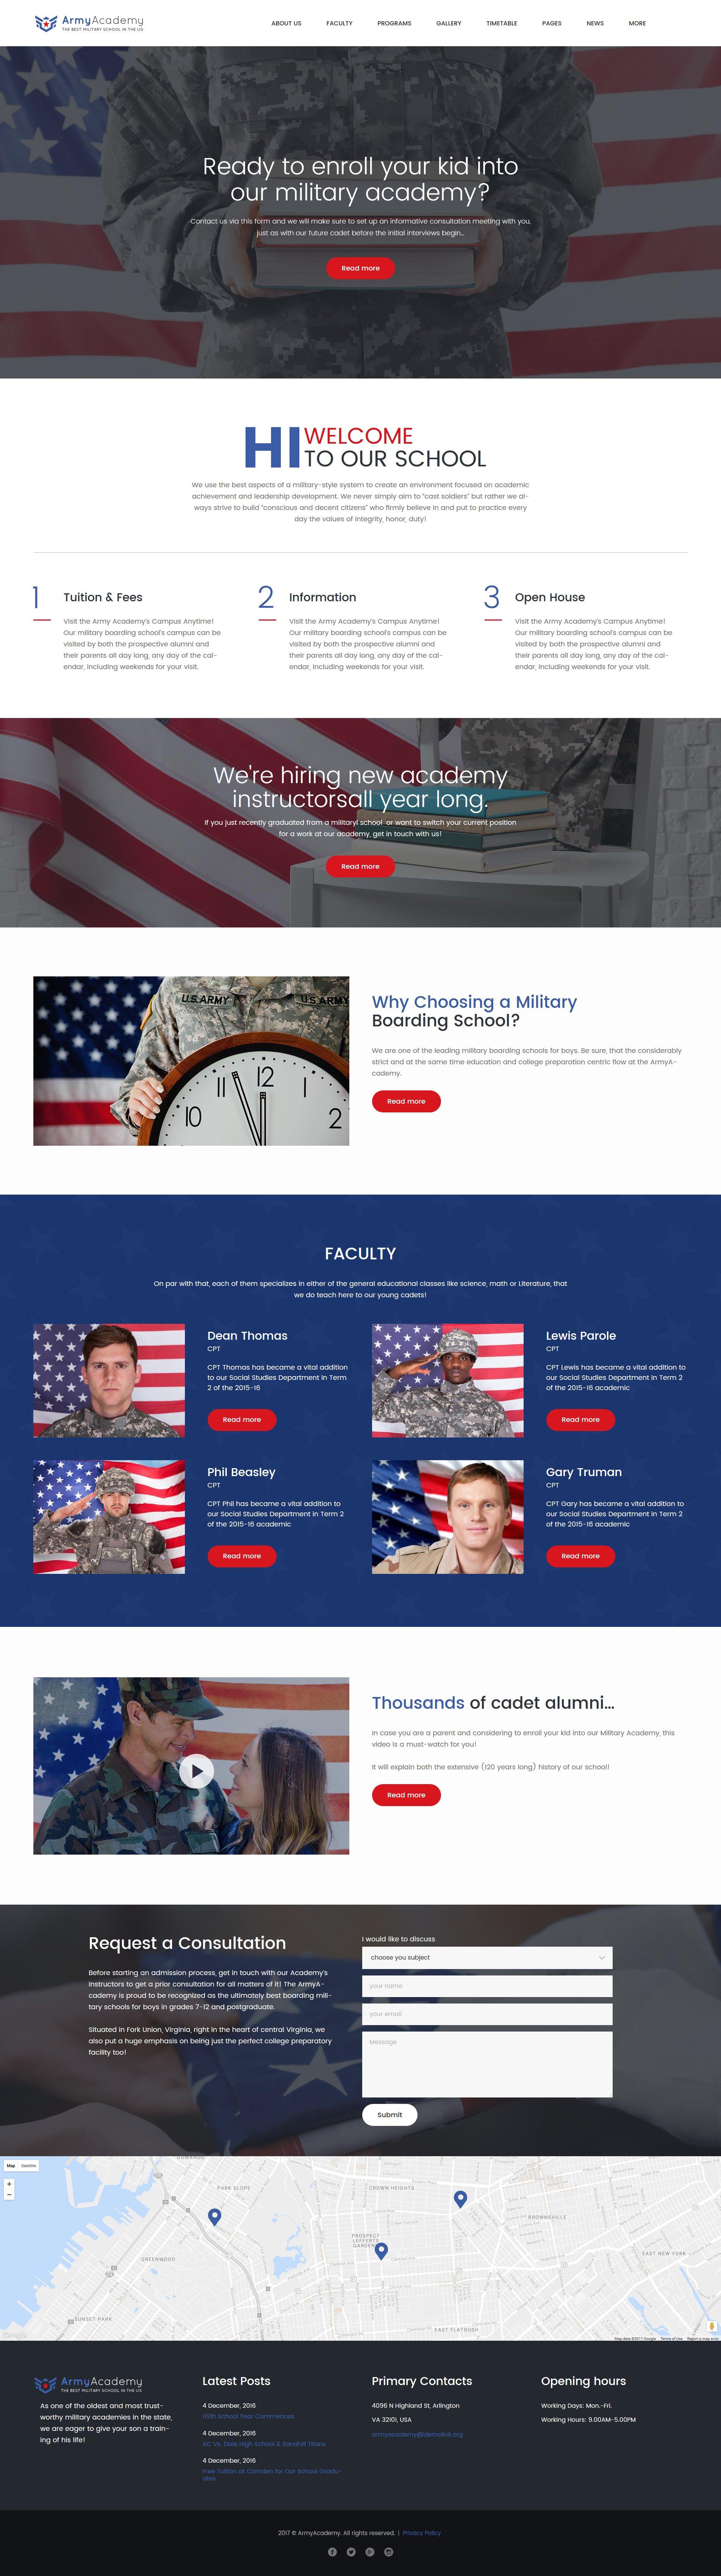 Responsivt Army - Military Academy Responsive WordPress-tema #61244